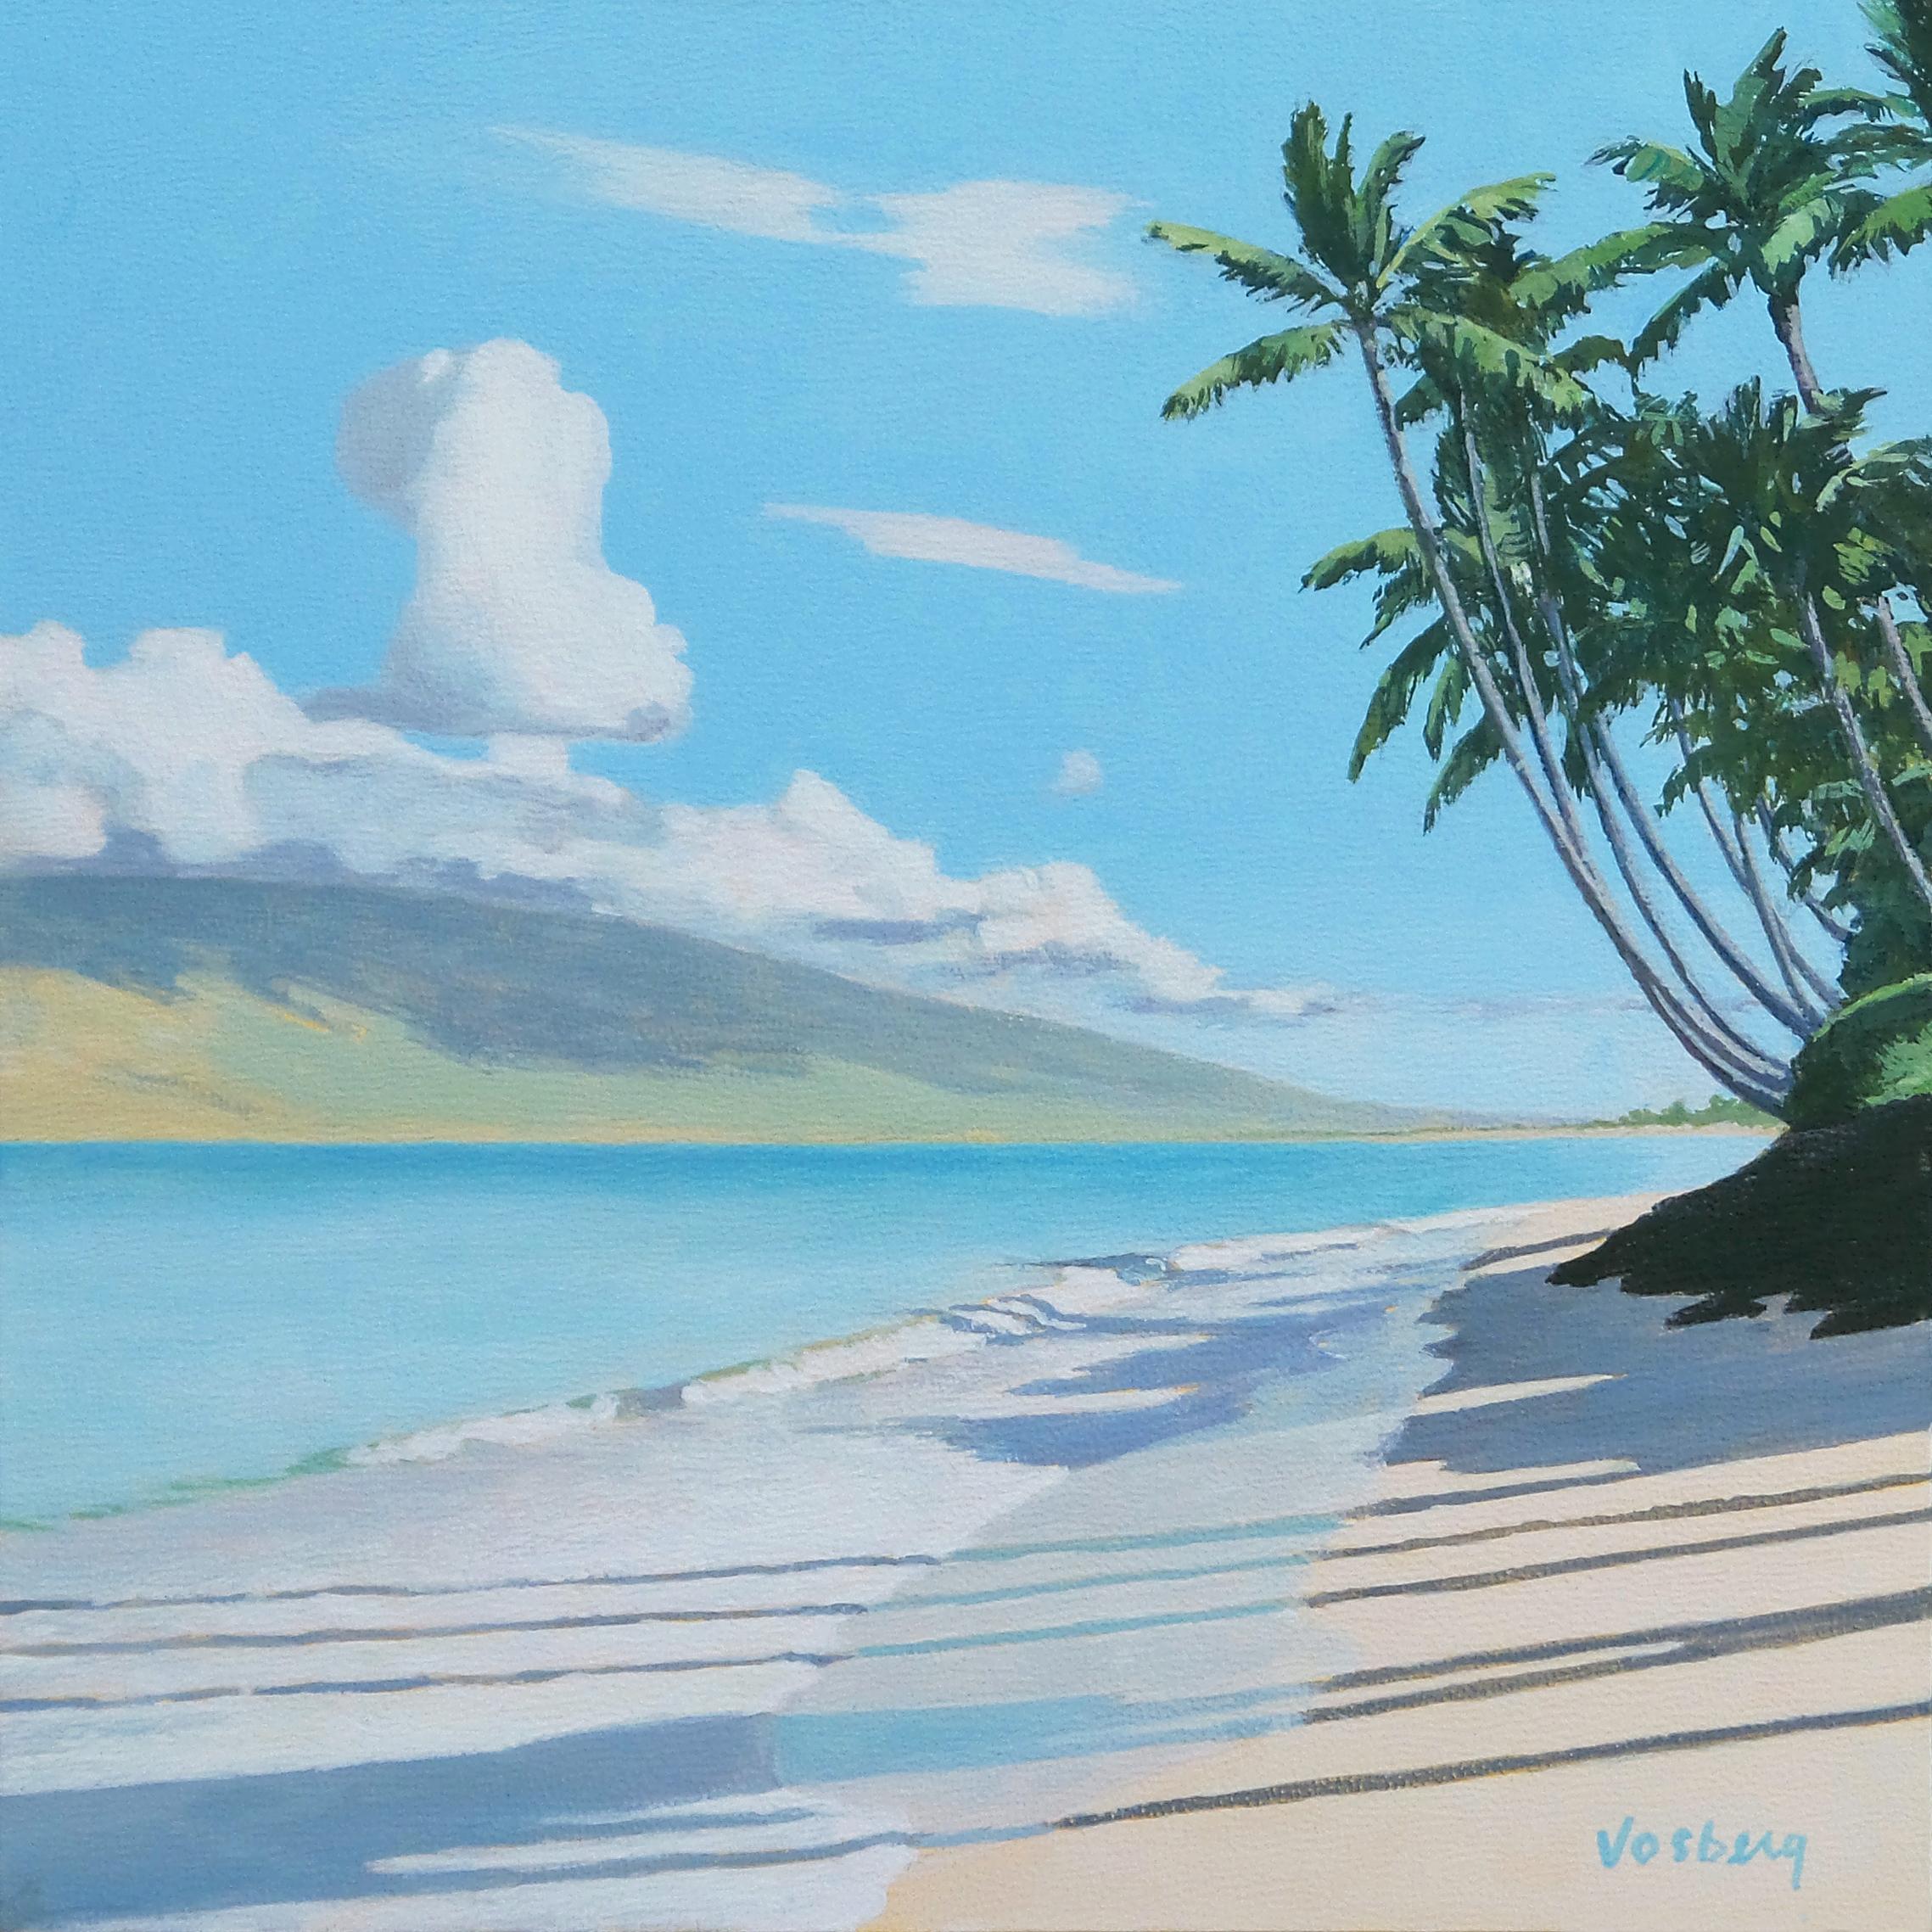 Hot Summer Beach Morning, Maui